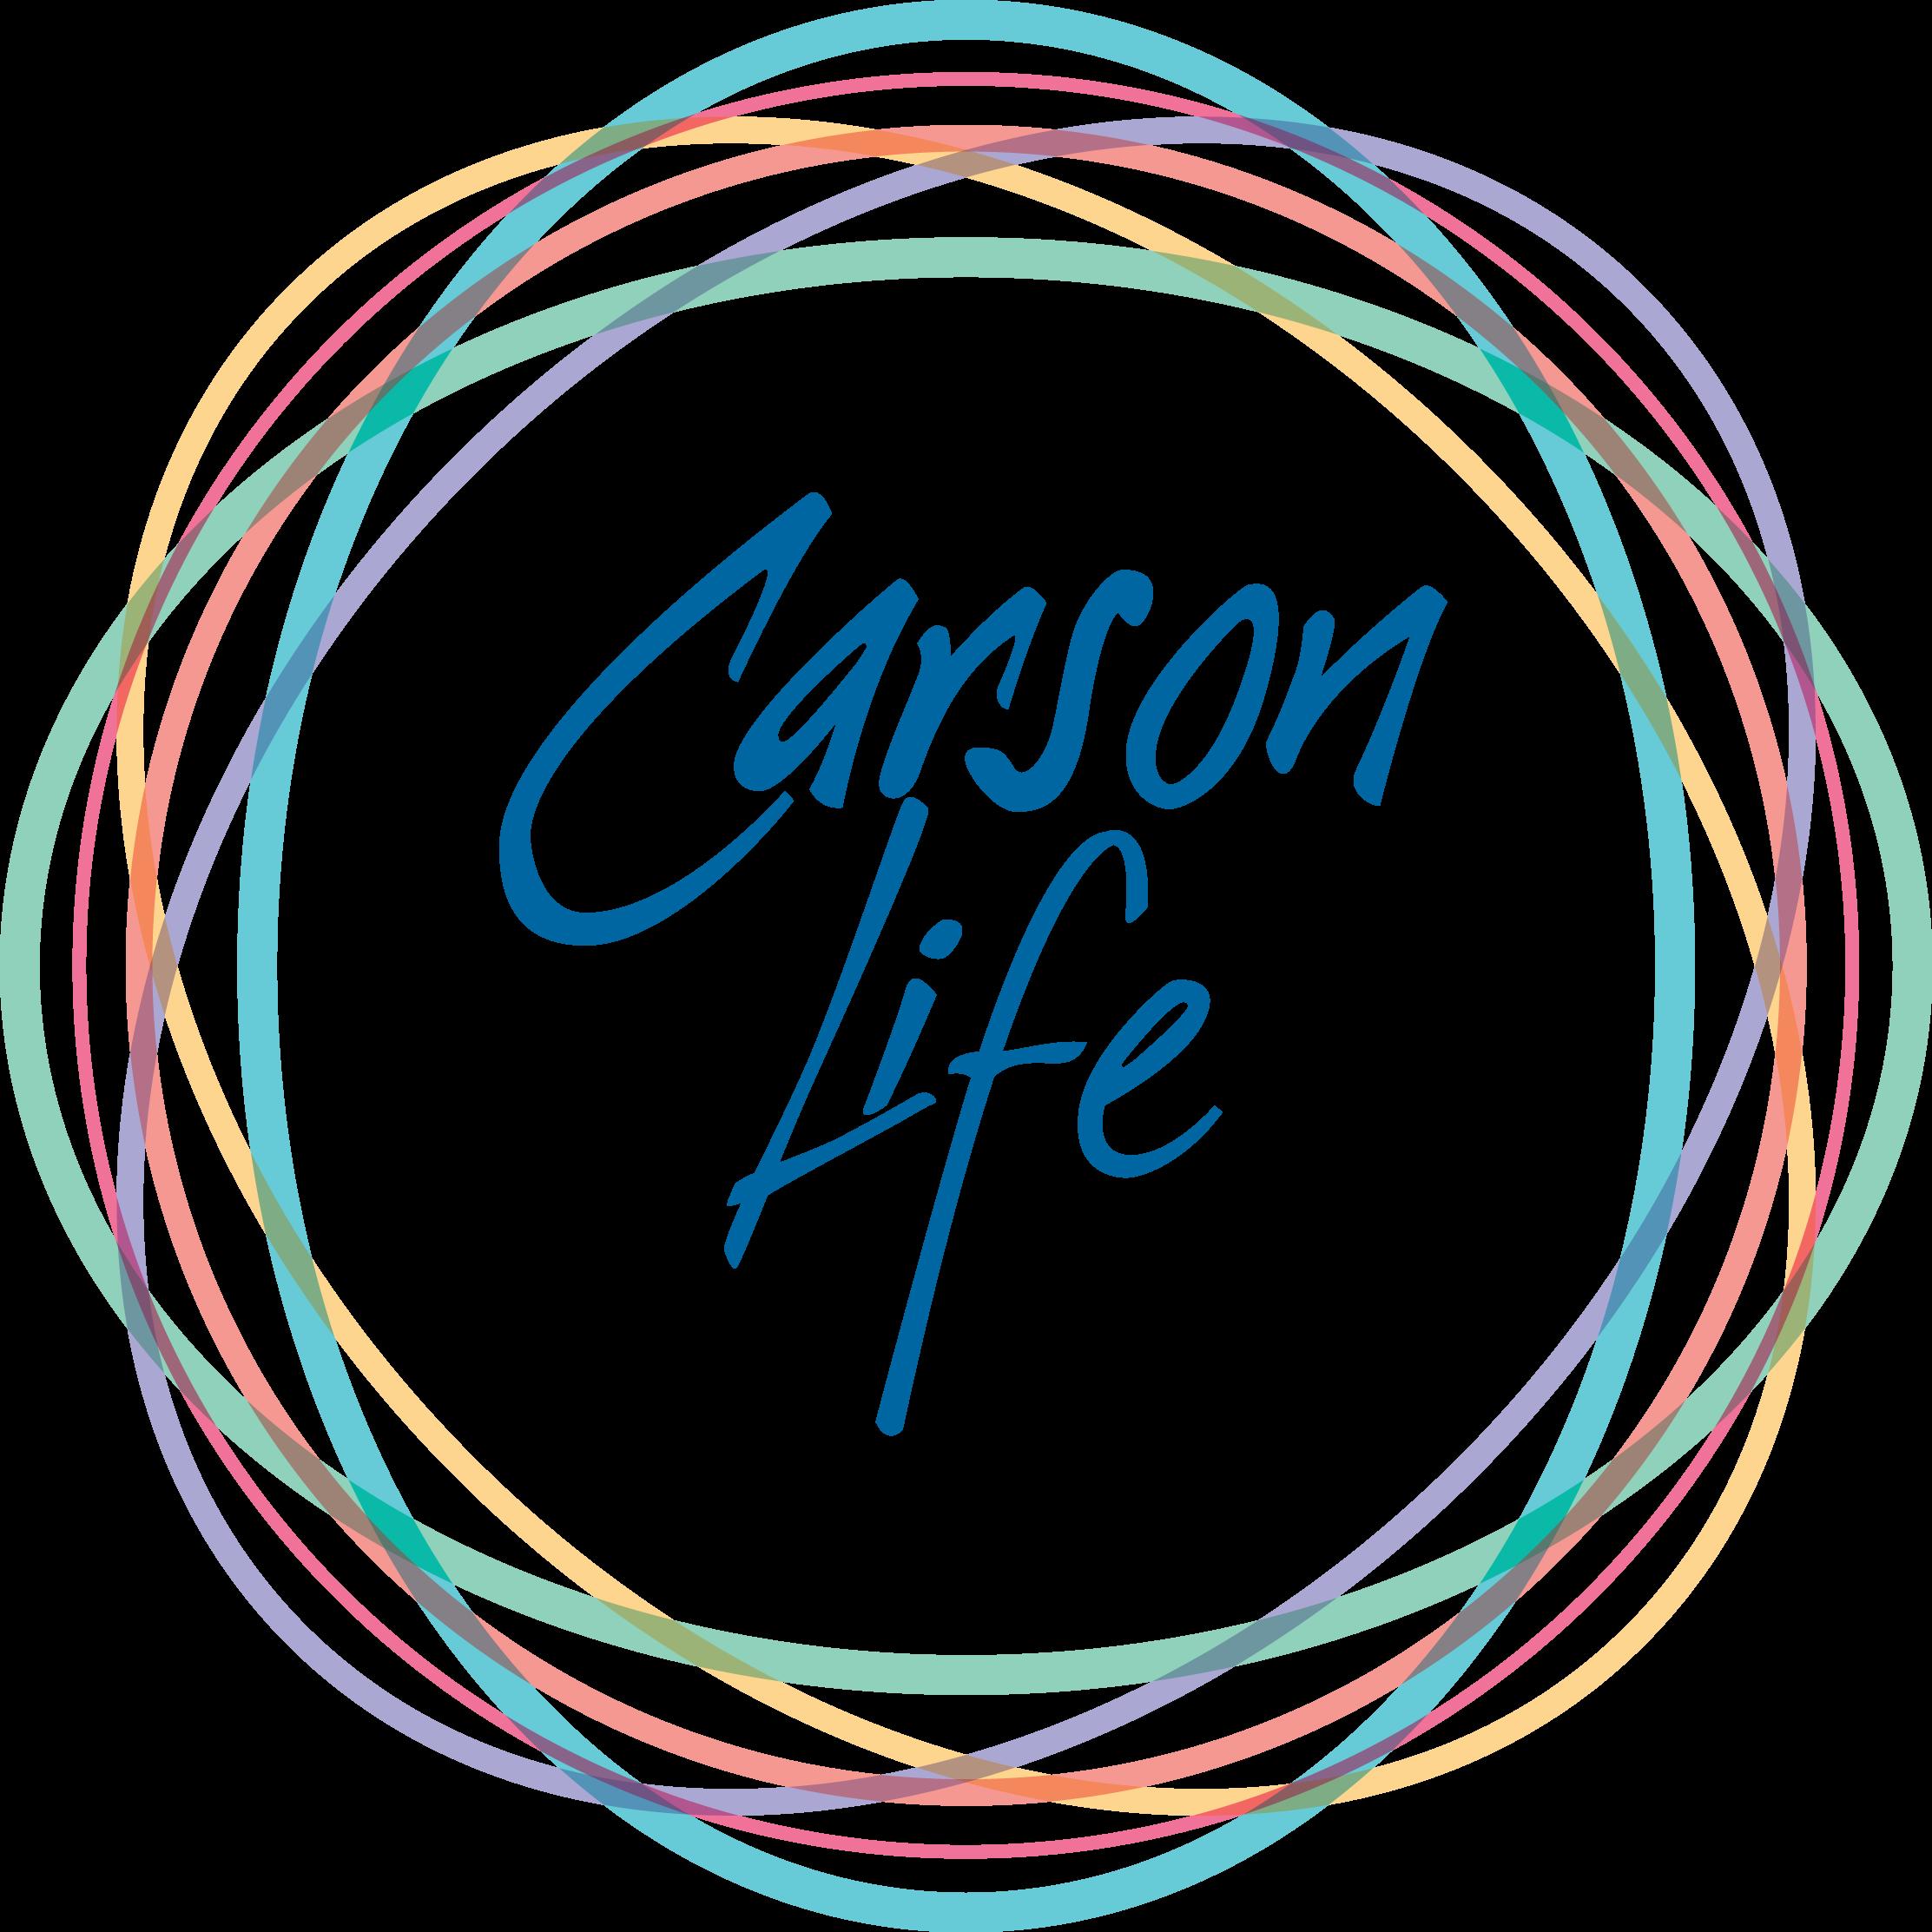 CarsonLife.png